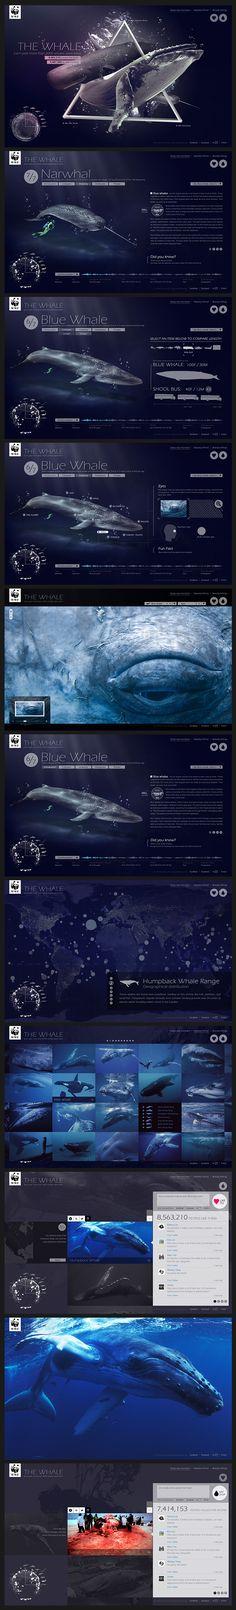 ...because I love the deep big blue  WWF - The Whale | #webdesign #it #web #design #layout #userinterface #website #webdesign <<< repinned by an #advertising #coffee #agency from #Hamburg / #Germany - www.BlickeDeeler.de | Follow us on www.facebook.com/BlickeDeeler